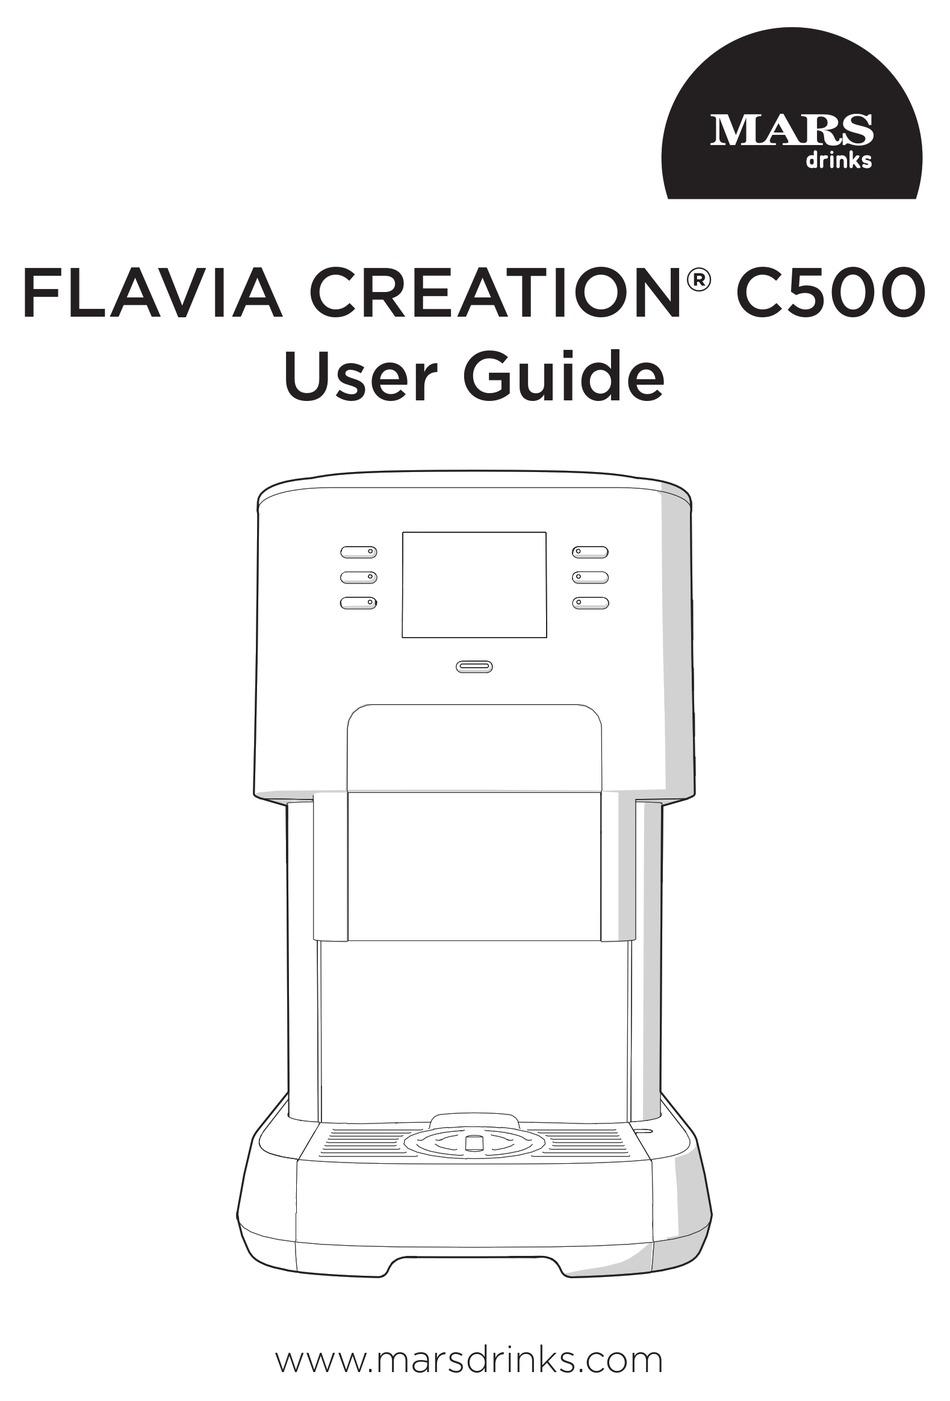 MARS FLAVIA CREATION C500 USER MANUAL Pdf Download